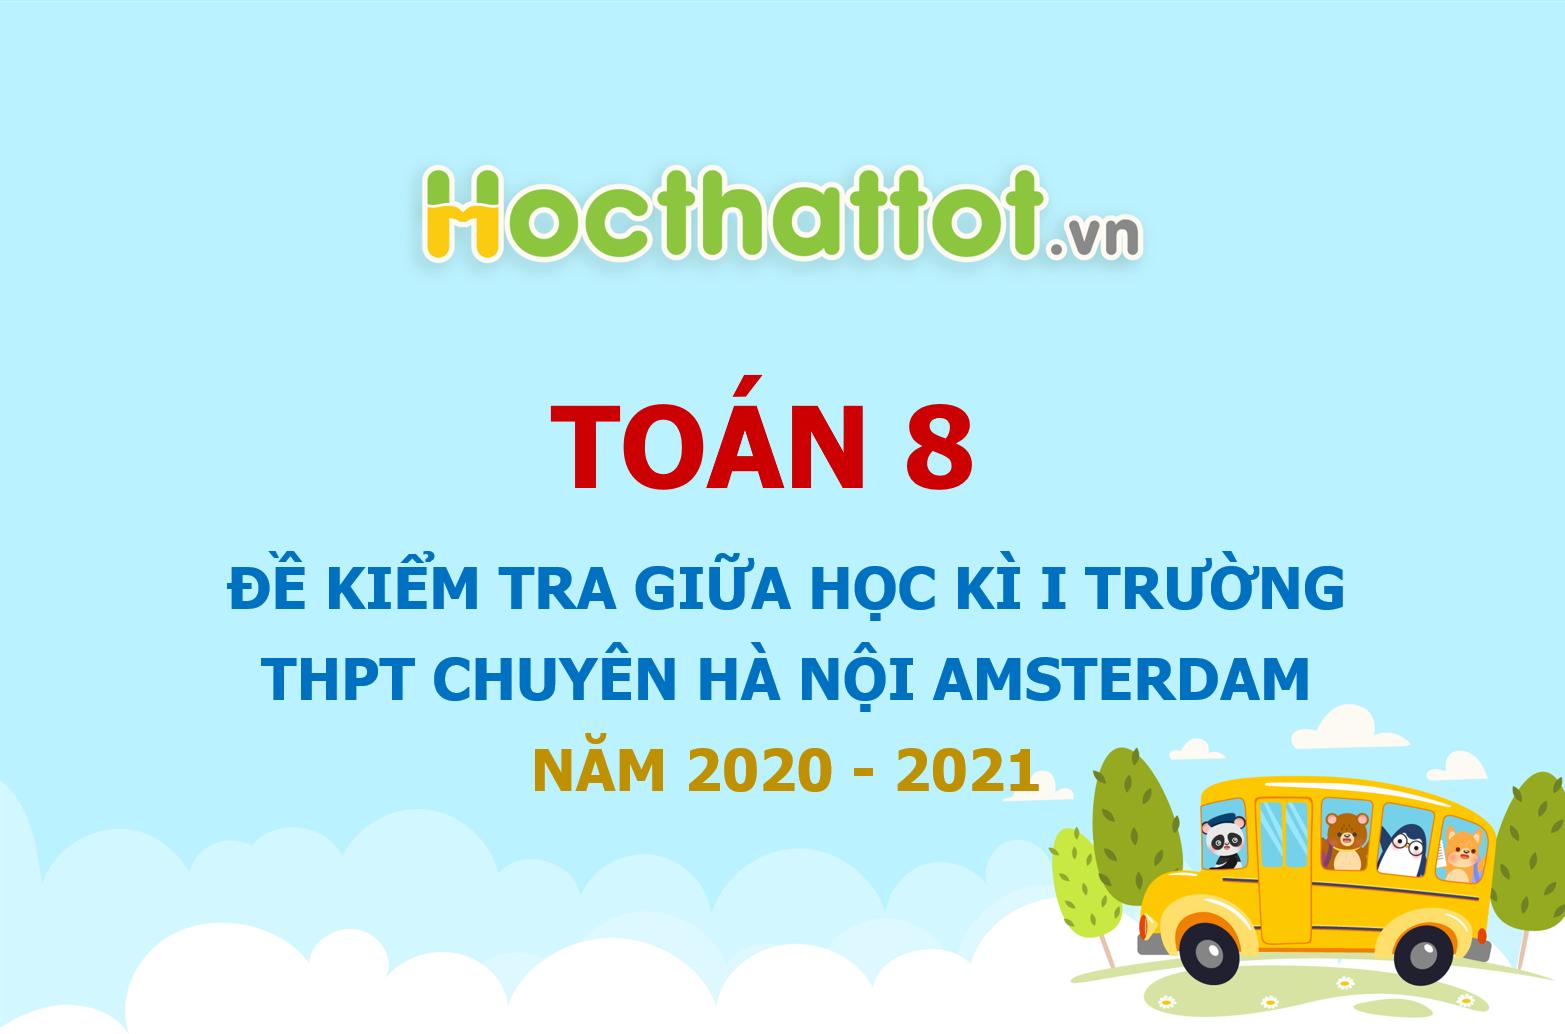 de-kiem-tra-giua-hoc-ki-1-truong-THPT-chuyen-Ha-Noi-Amsterdam-nam-2020-2021